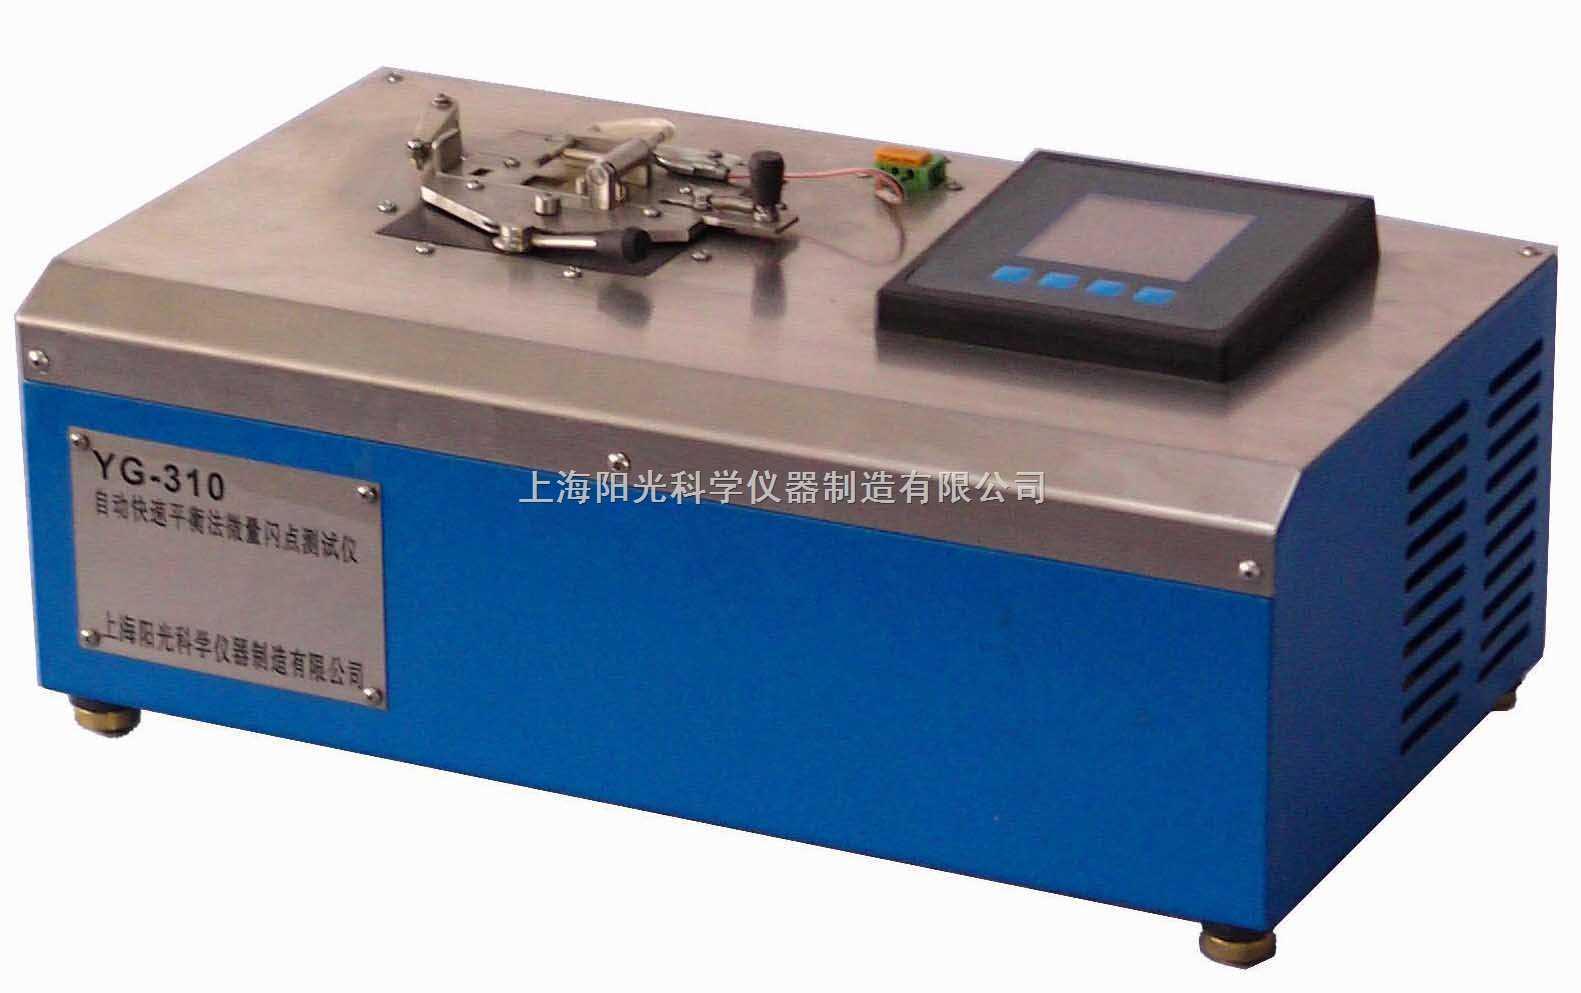 YG-310自动快速平衡法微量闪点测试仪(GB/T5208-2008)